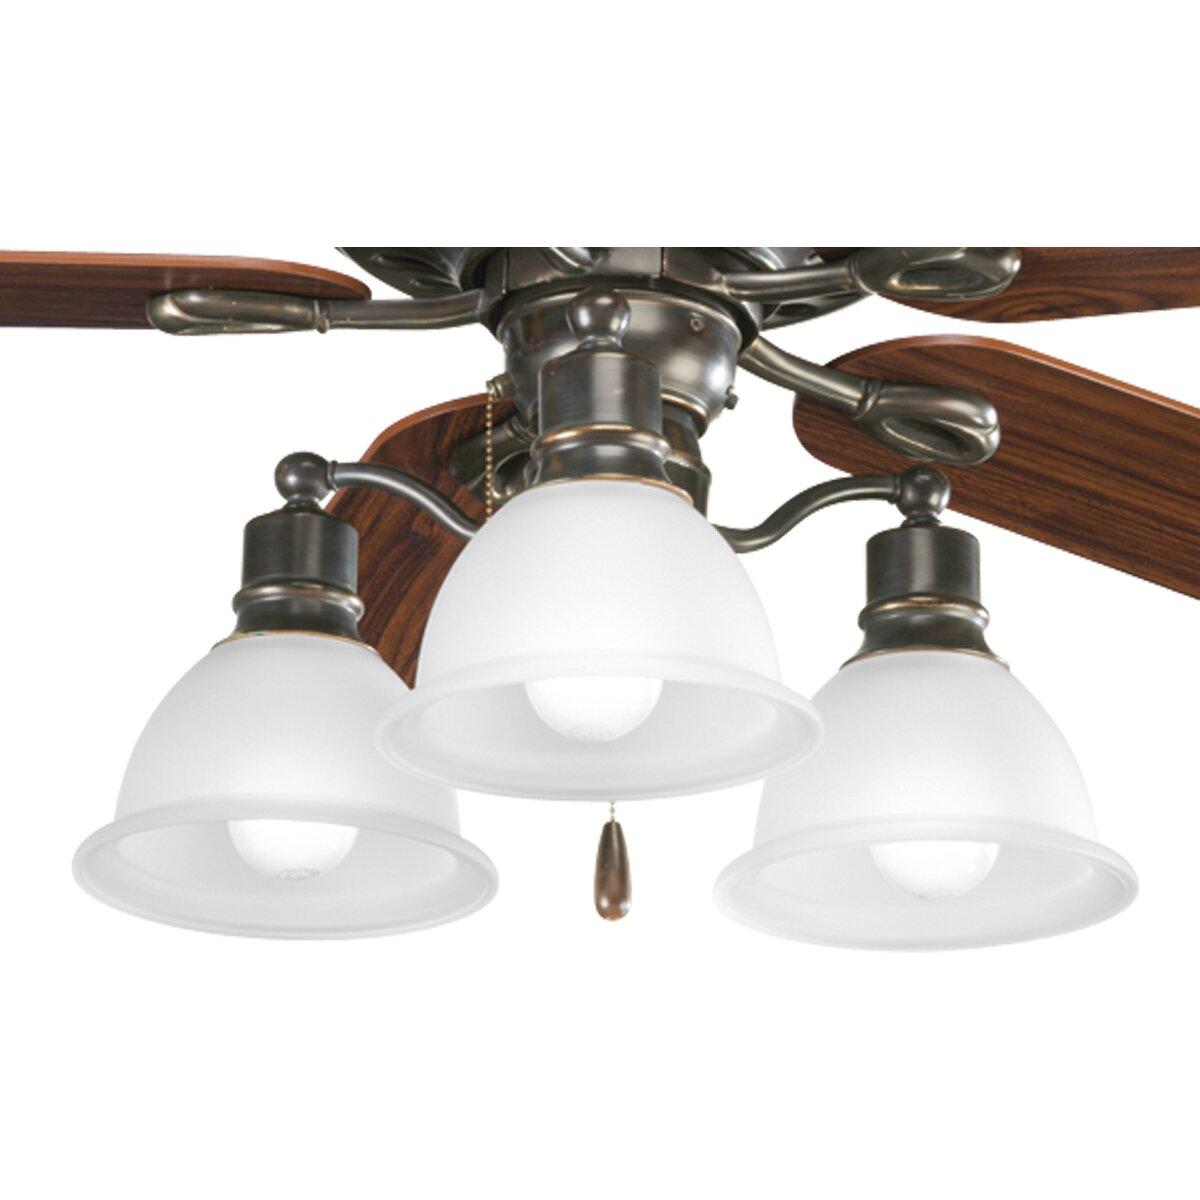 Madison 3-Light Branched Ceiling Fan Light Kit